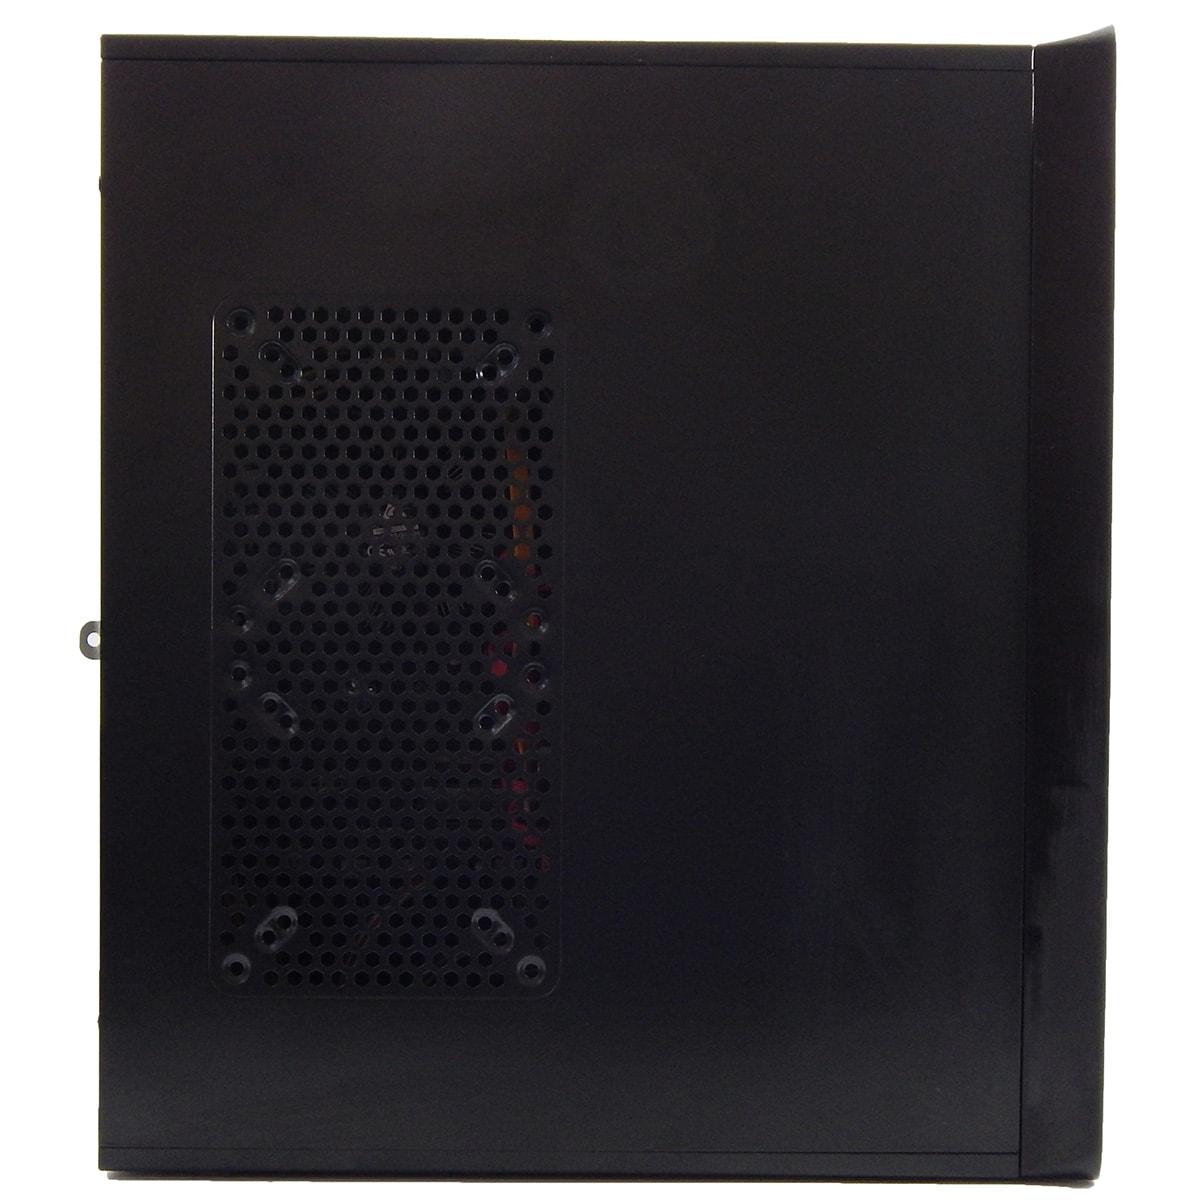 PC POSITIVO PREMIUM DR8215 I5-3330 - 4Gb - 500Gb - DVD - Reembalado